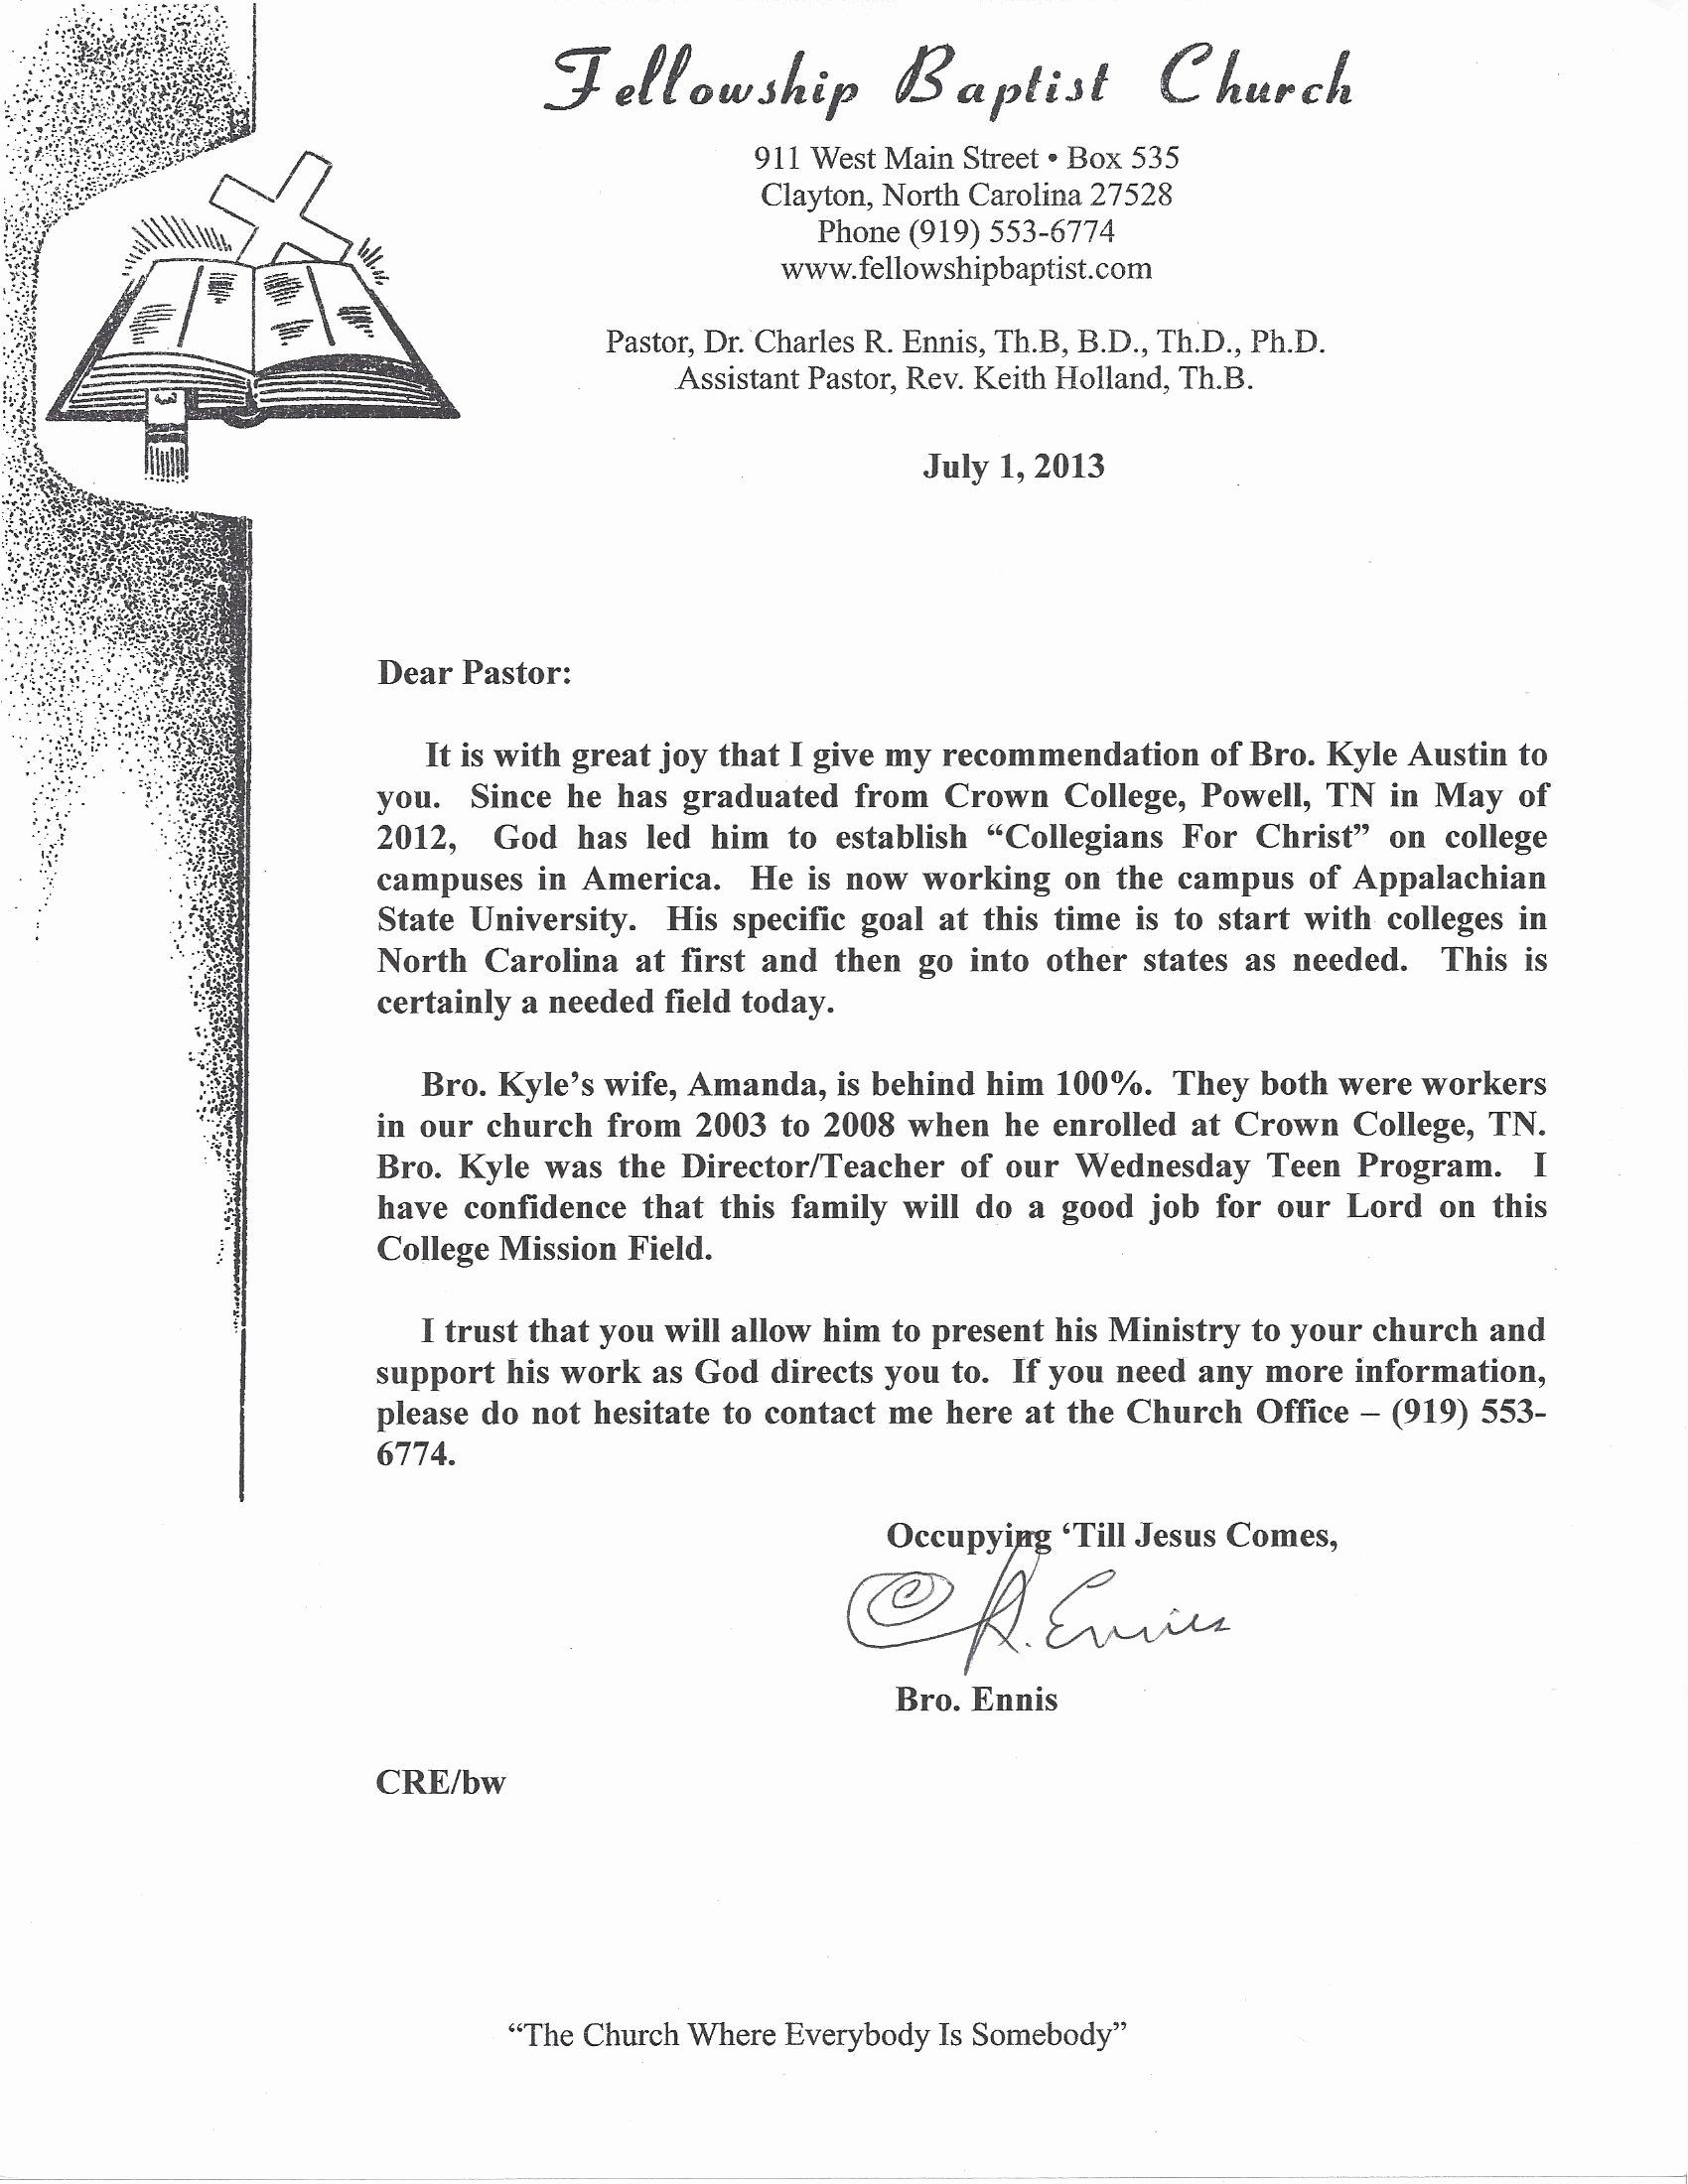 Pastor Letter Of Recommendation Elegant Pastoral Reference Letter Examples